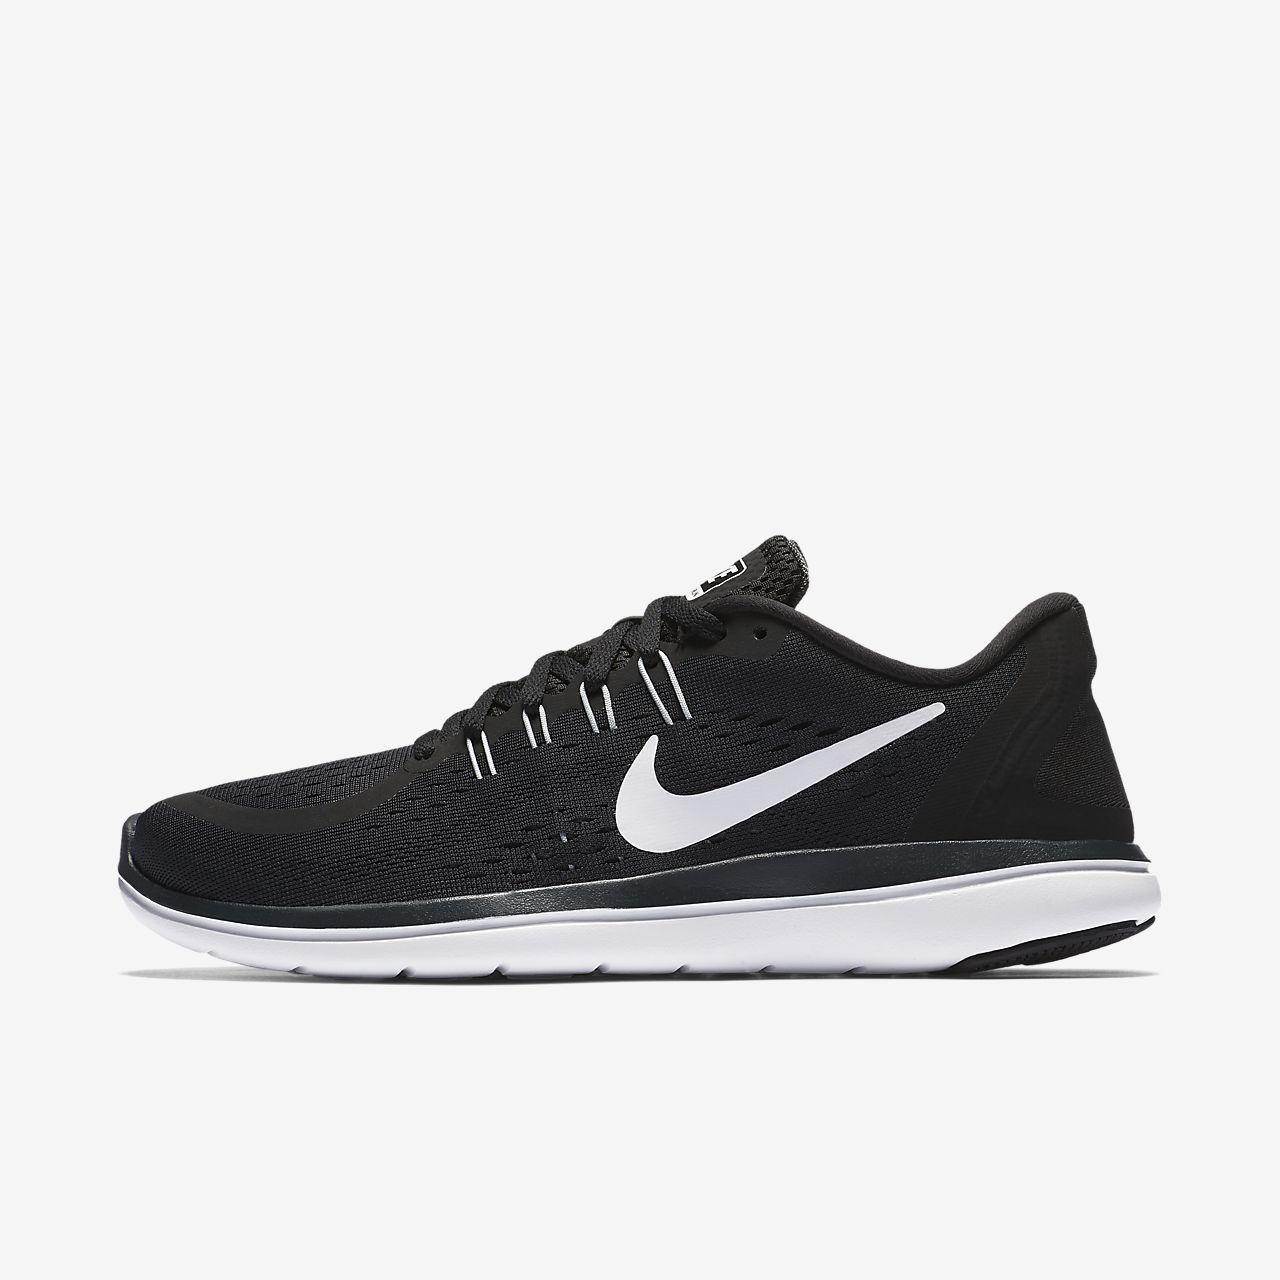 7f959de8bf7c Nike Flex 2017 RN Women s Running Shoe in Black White